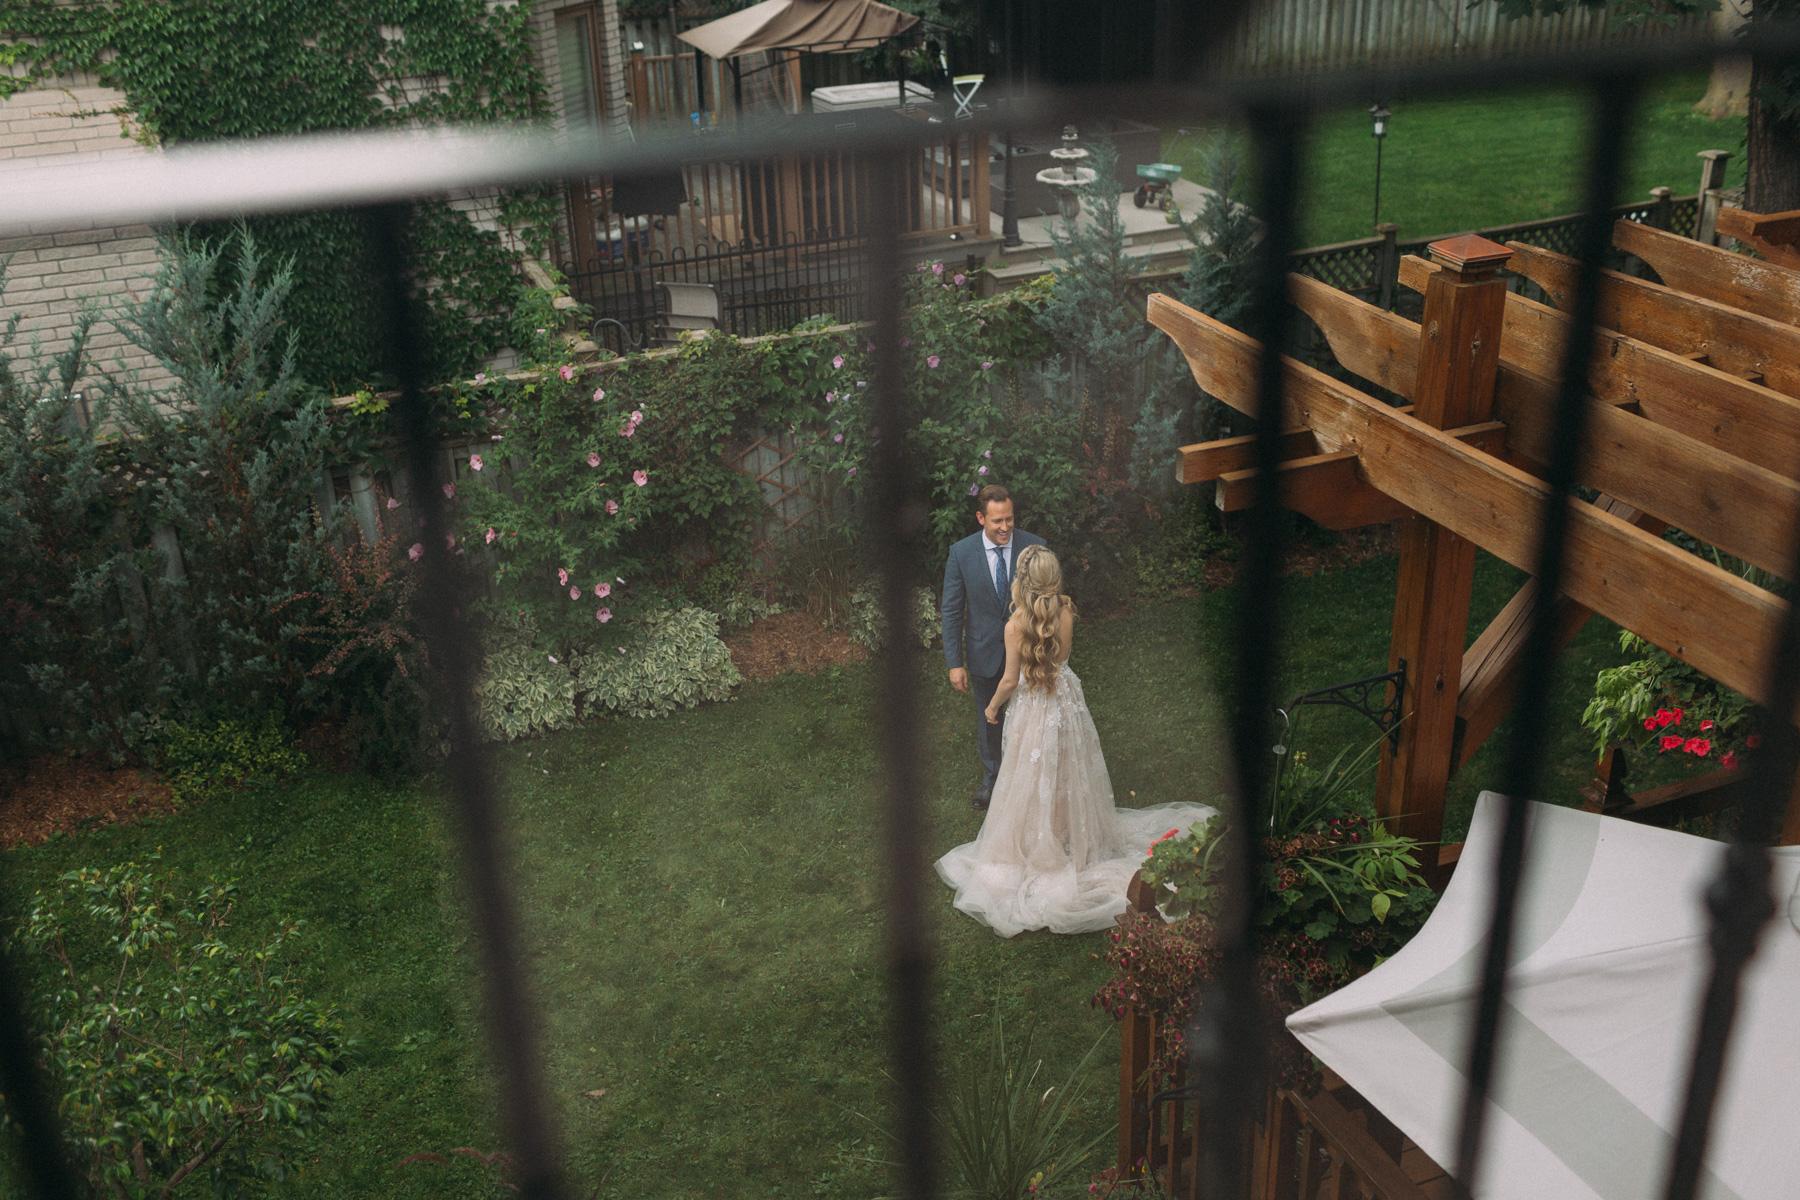 La-Maquette-wedding-by-Toronto-modern-wedding-photographer-Sam-Wong_14.jpg